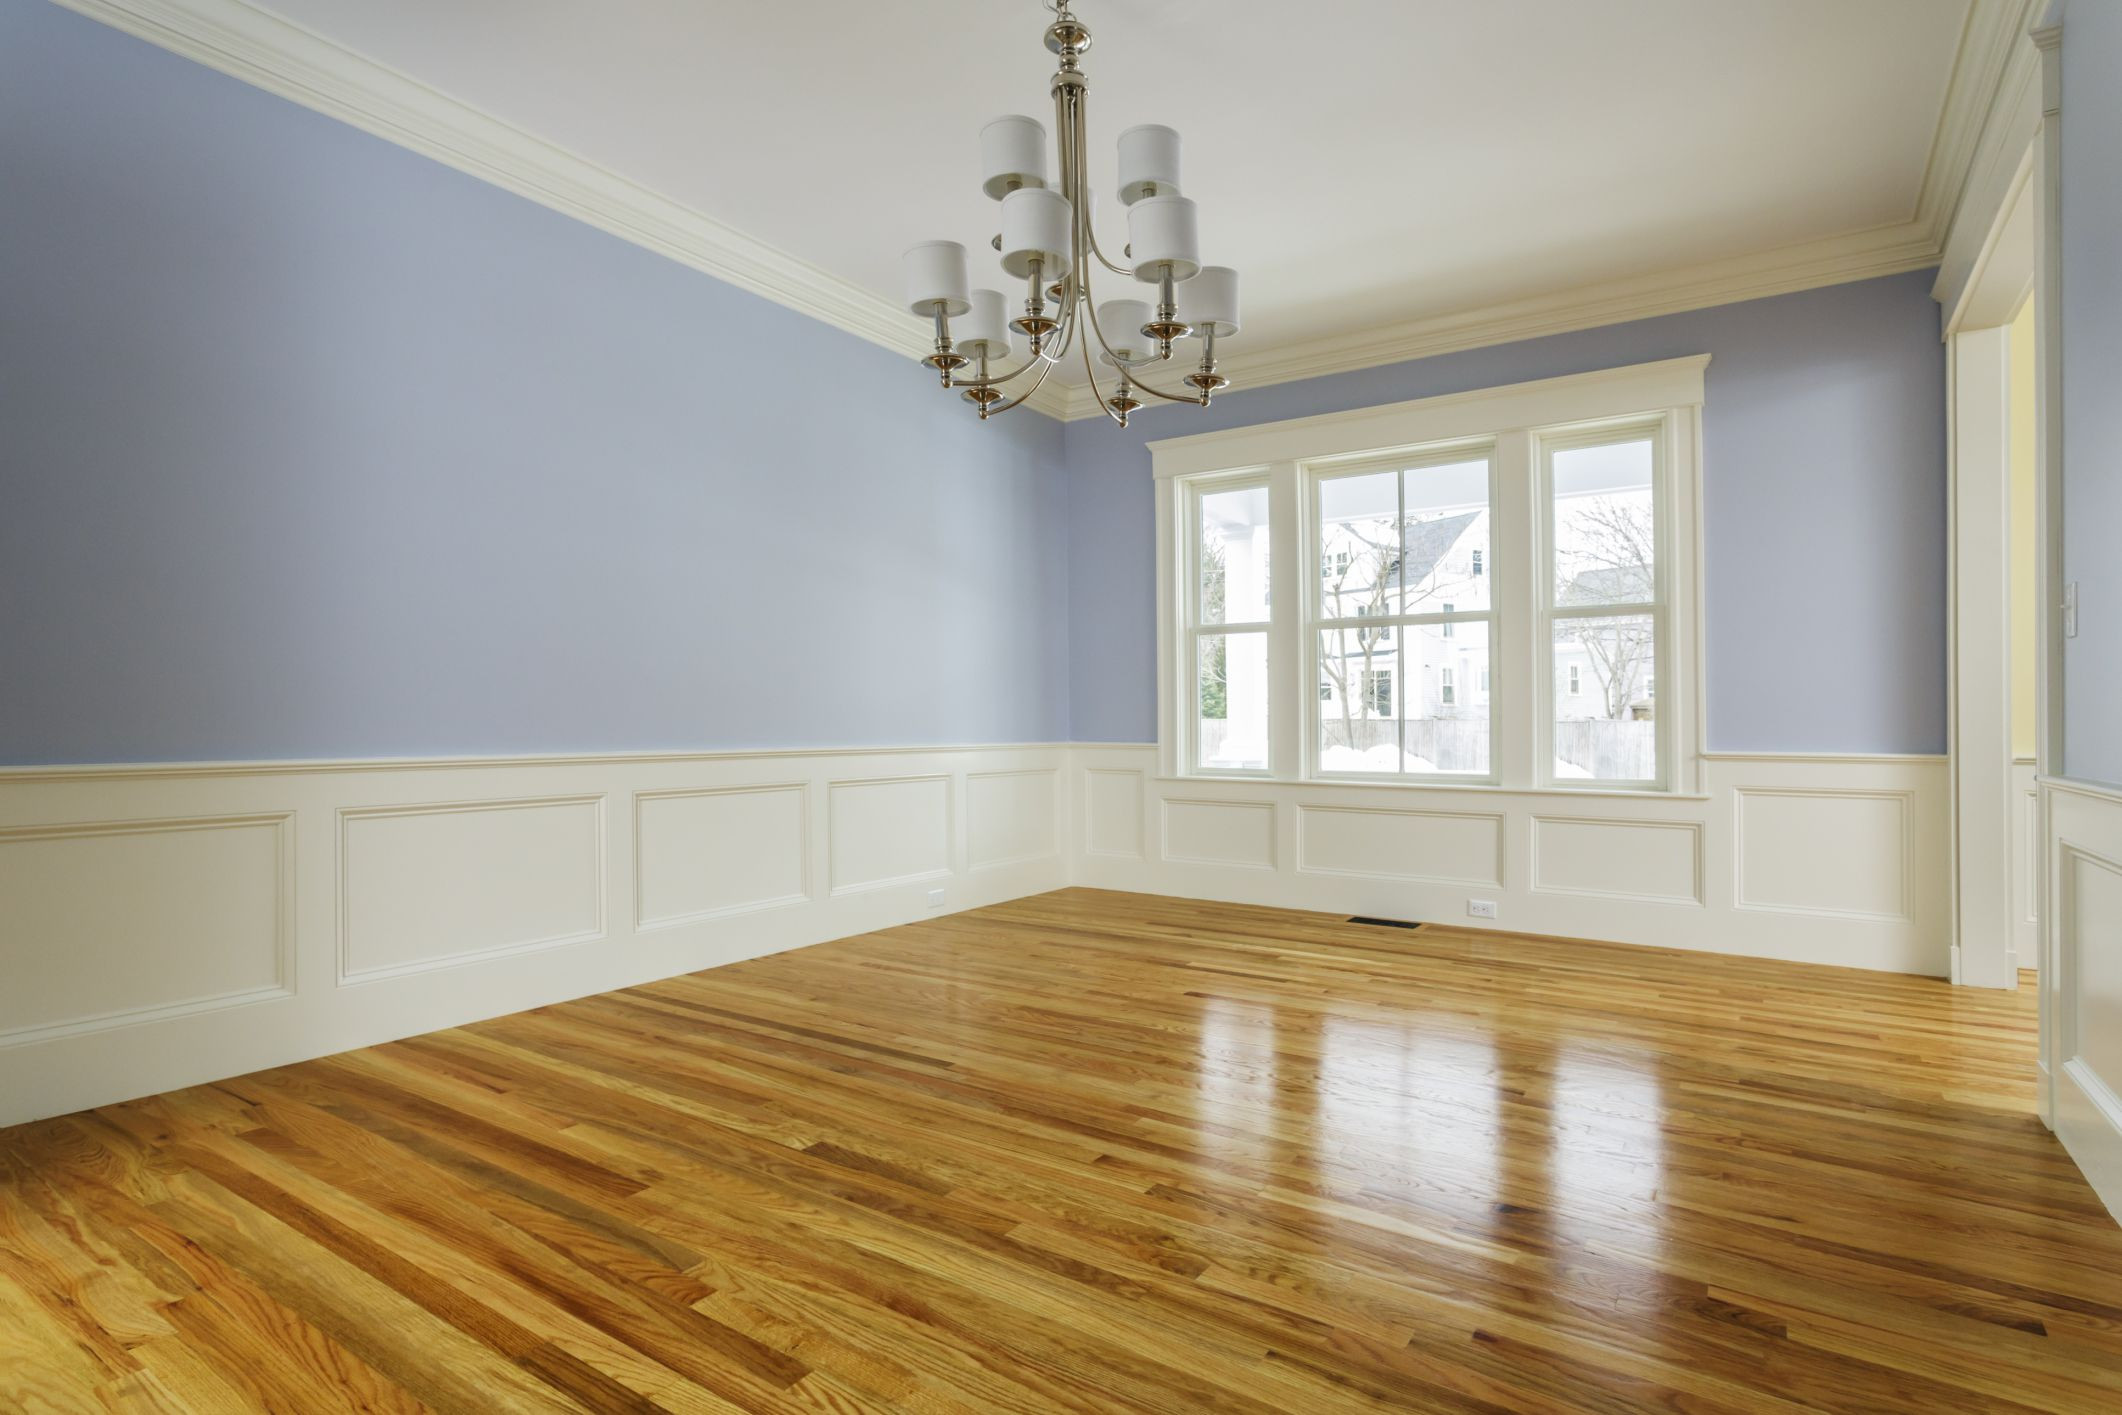 29 Unique Redoing Hardwood Floors Diy 2021 free download redoing hardwood floors diy of the cost to refinish hardwood floors inside 168686572 highres 56a2fd773df78cf7727b6cb3